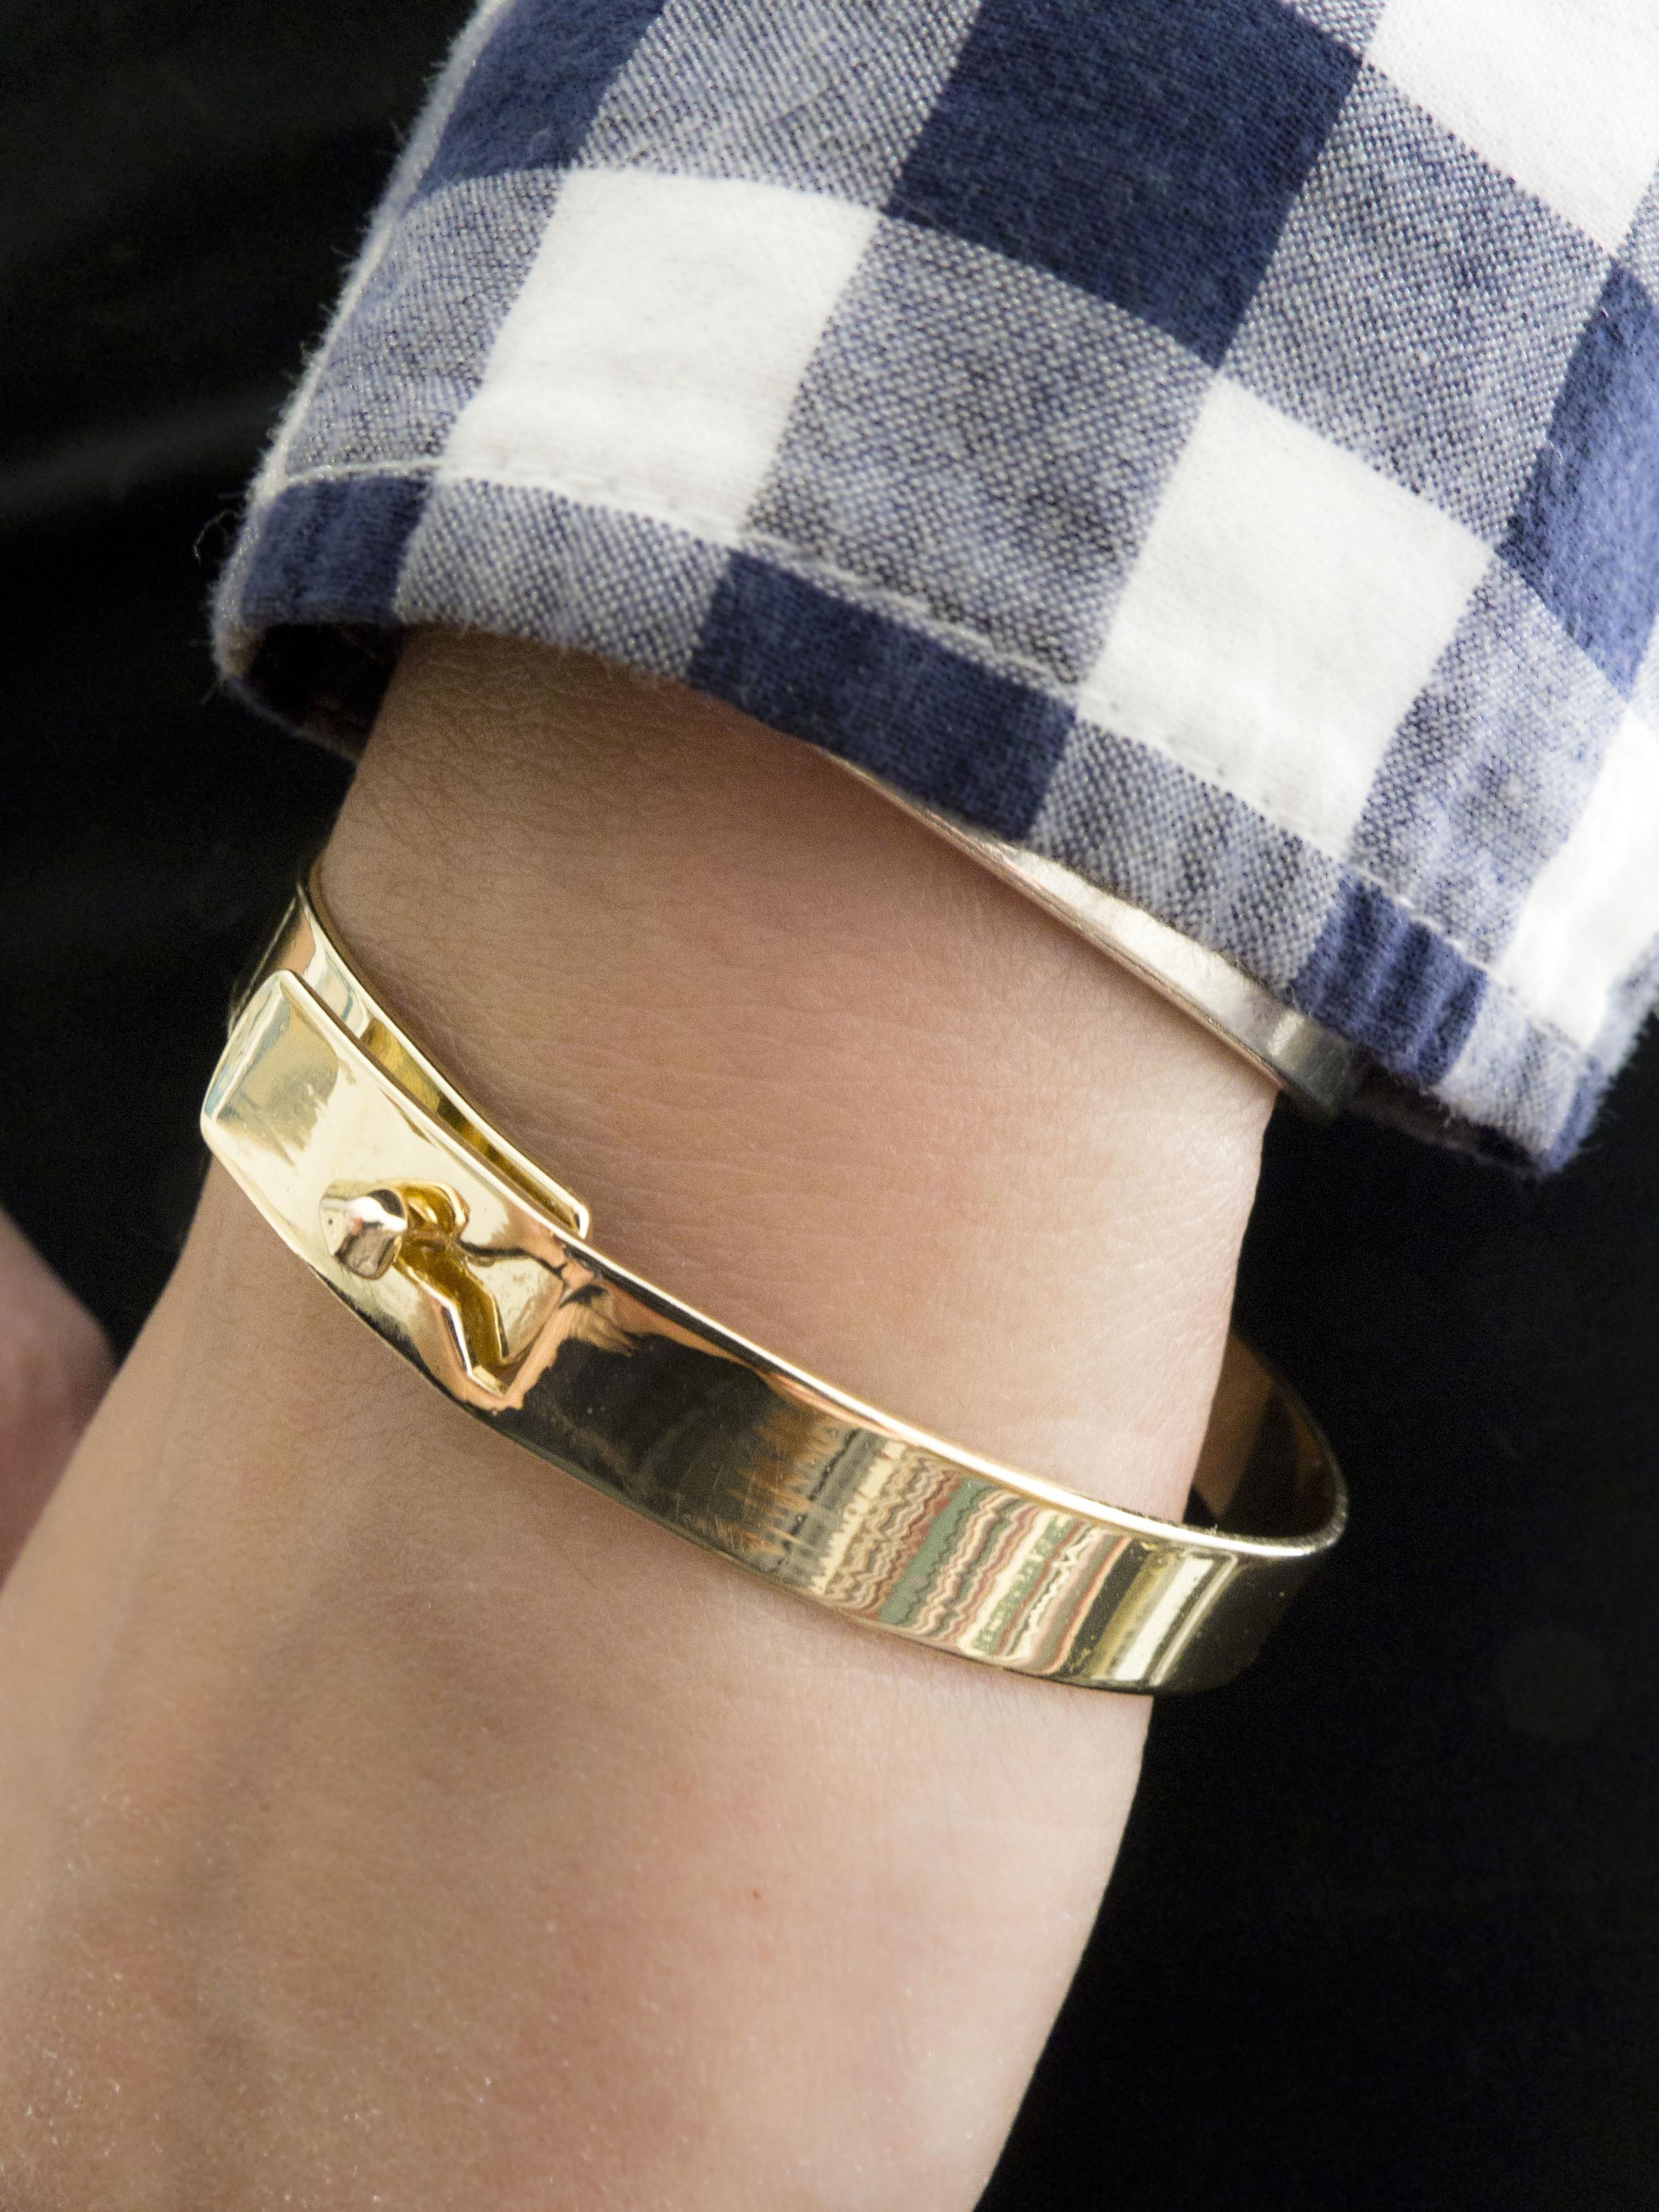 moorea seal: peg bracelet in gold